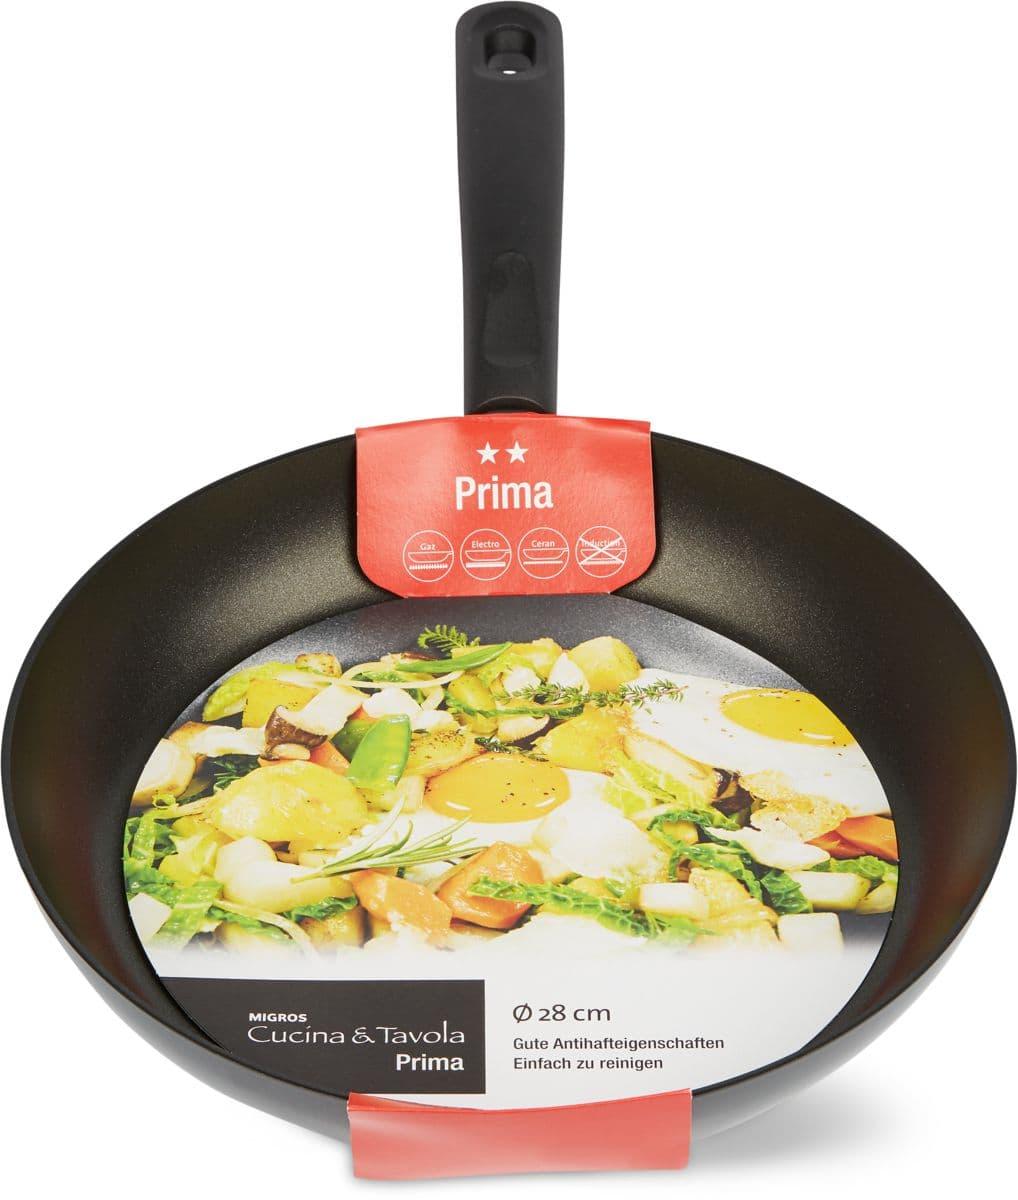 Cucina & Tavola PRIMA Padella 28cm flat